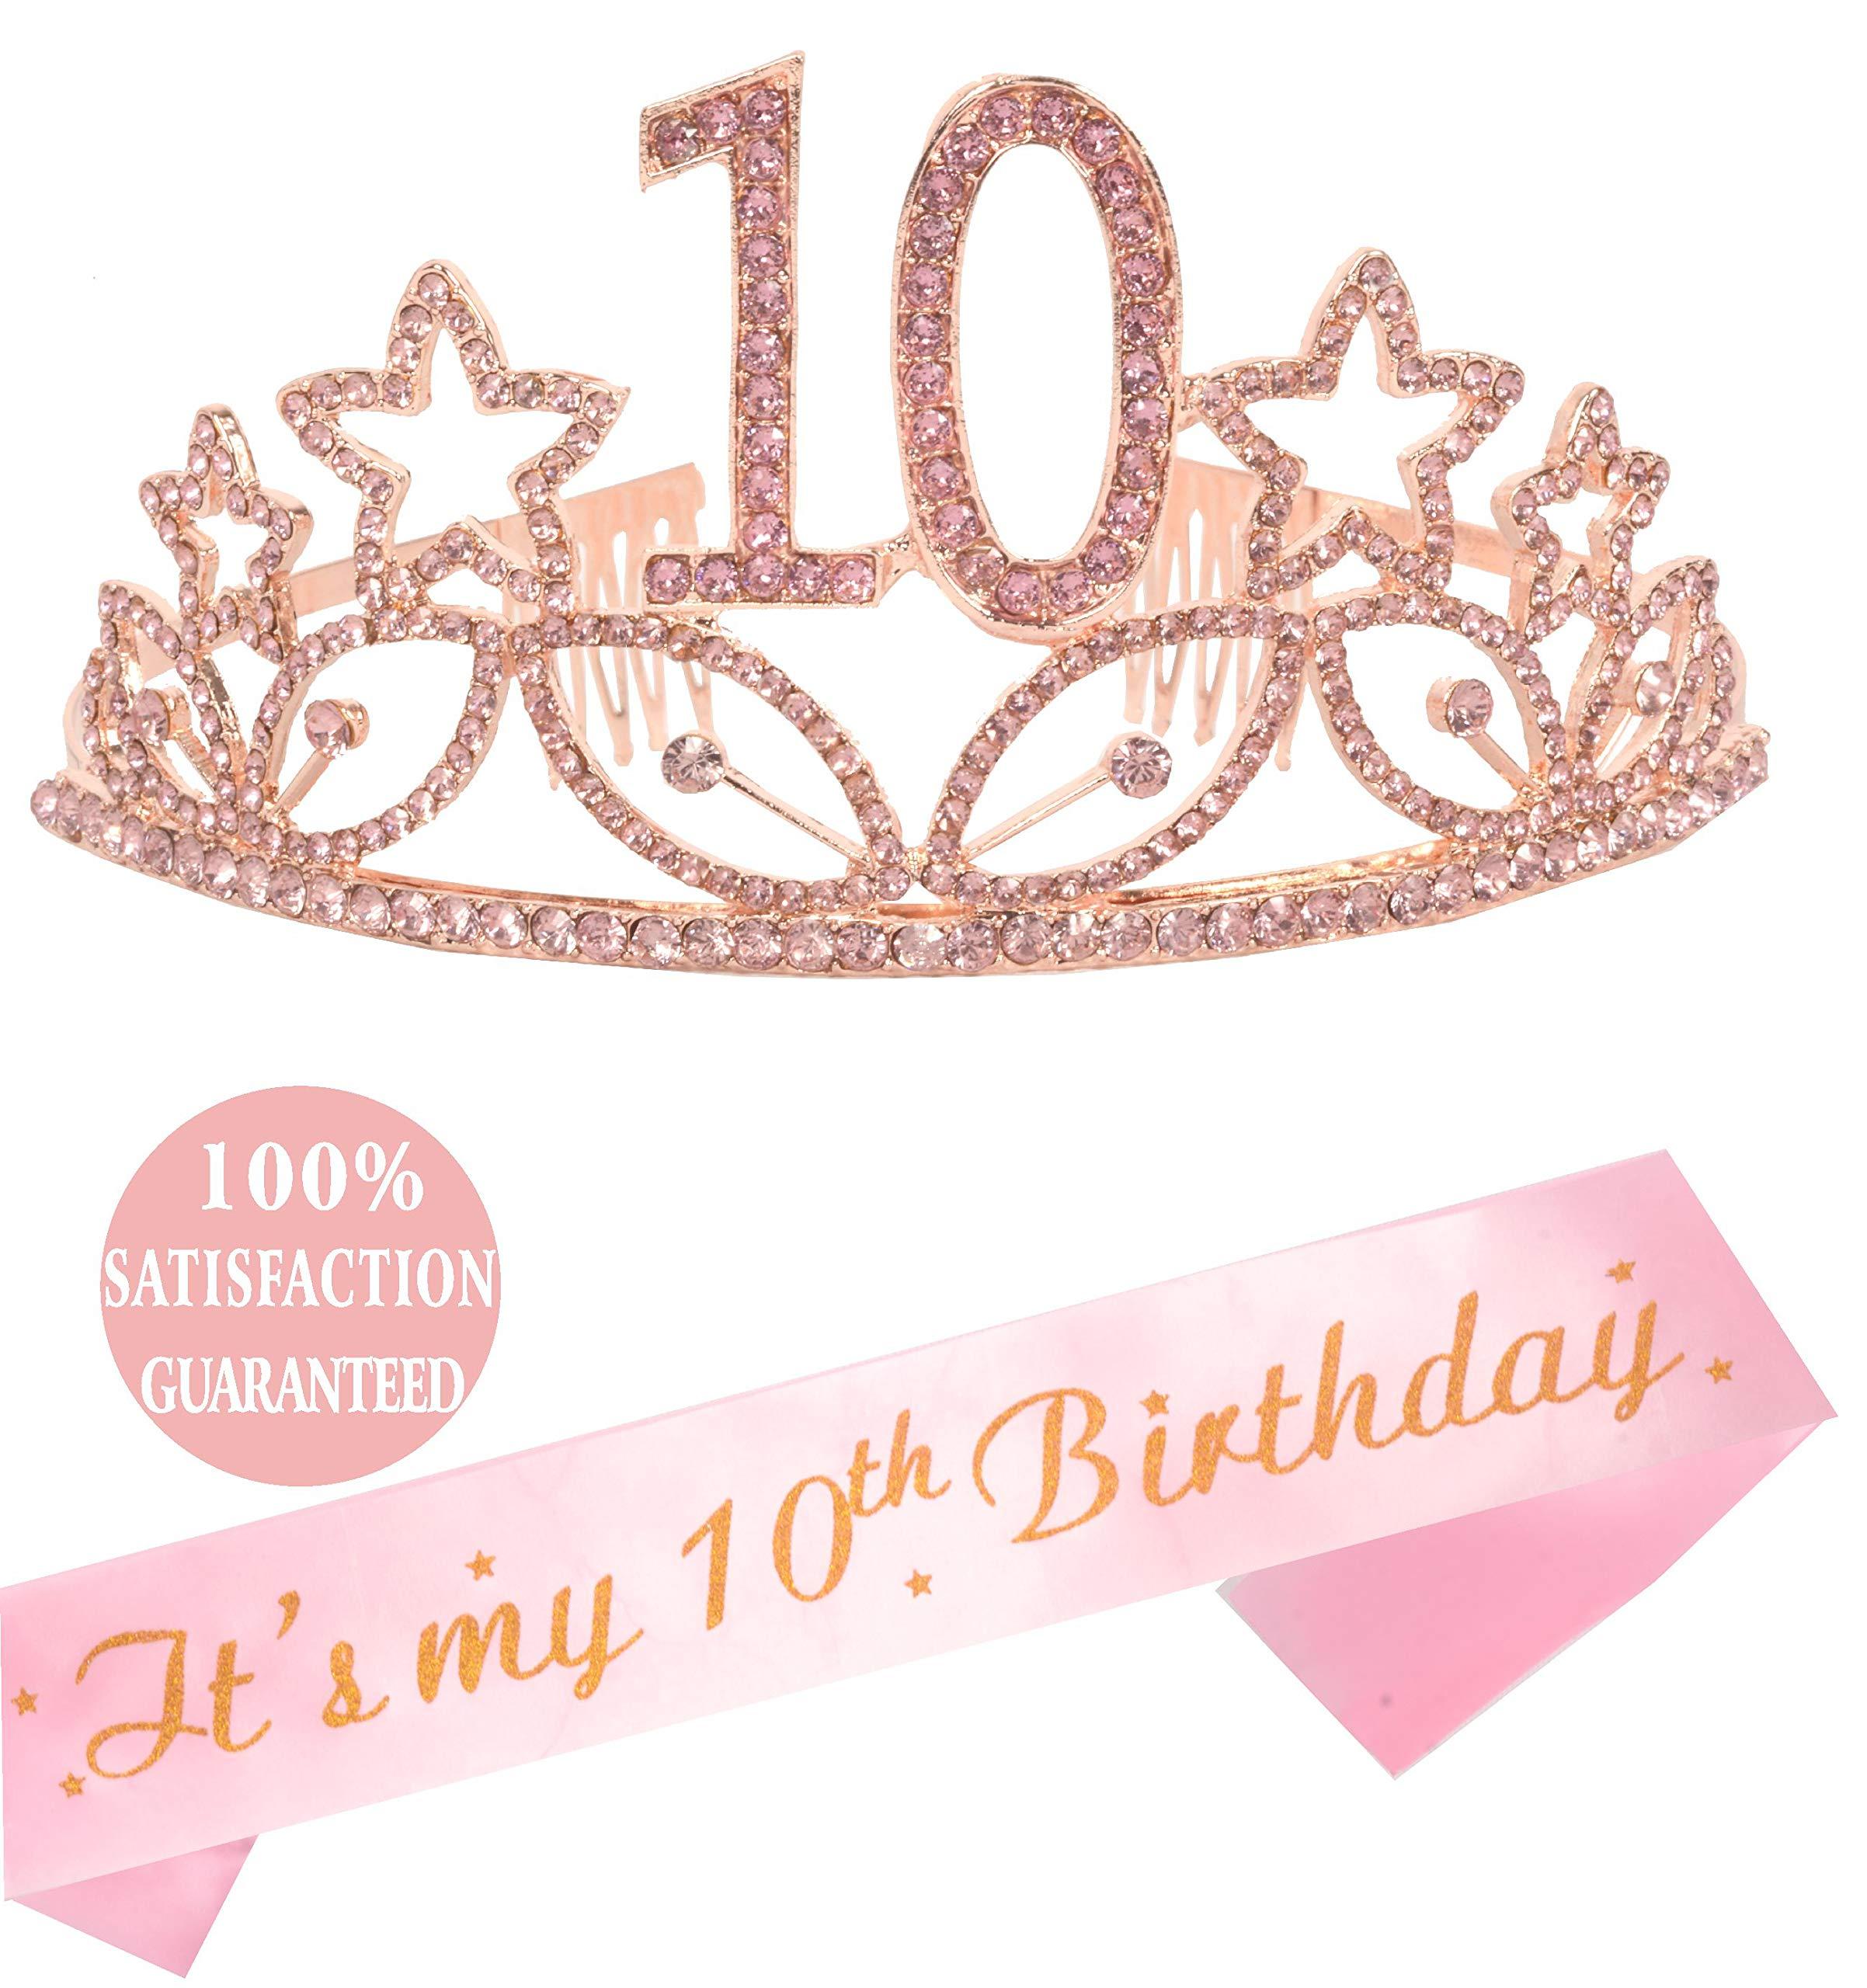 Birthday Girl Sash Tiara Crown girl Princess decoration photo prop gift favor.